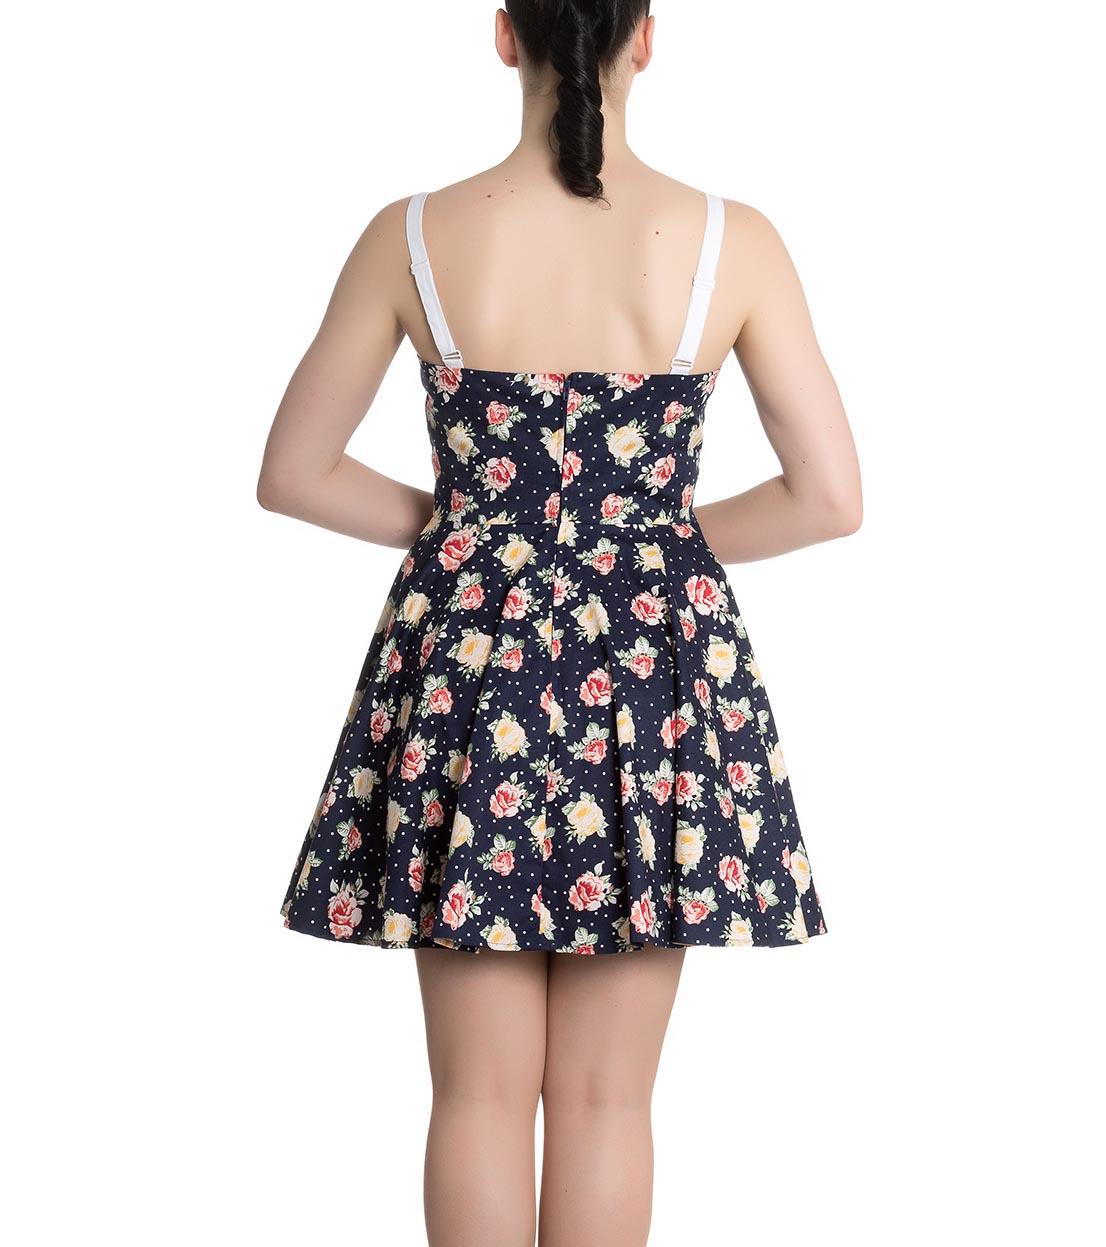 Hell-Bunny-Navy-Blue-Floral-Roses-Flowers-Mini-Dress-EMMA-Polka-Dot-All-Sizes thumbnail 21